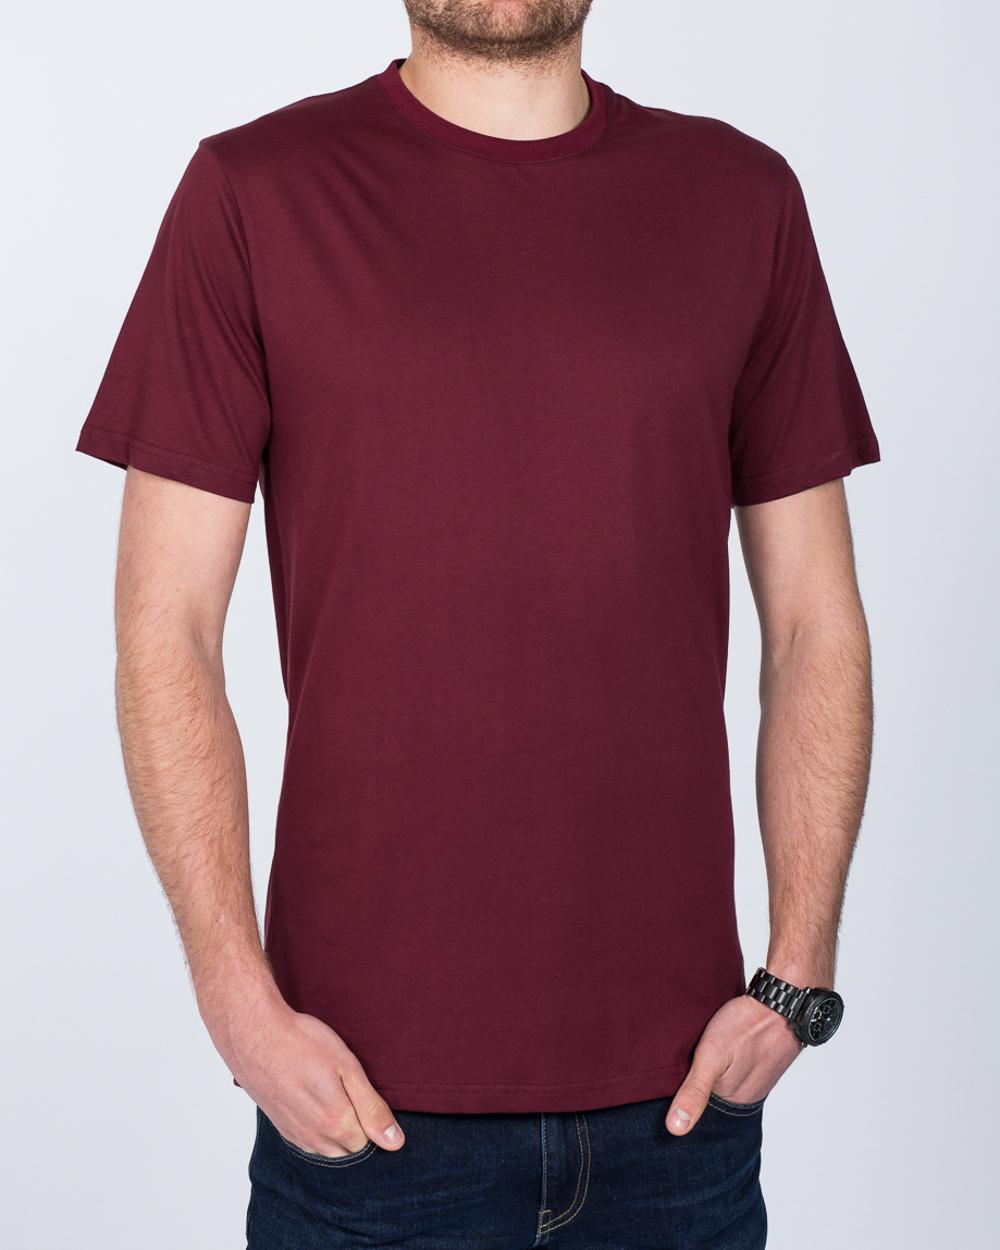 2t Tall T-Shirt (burgundy)